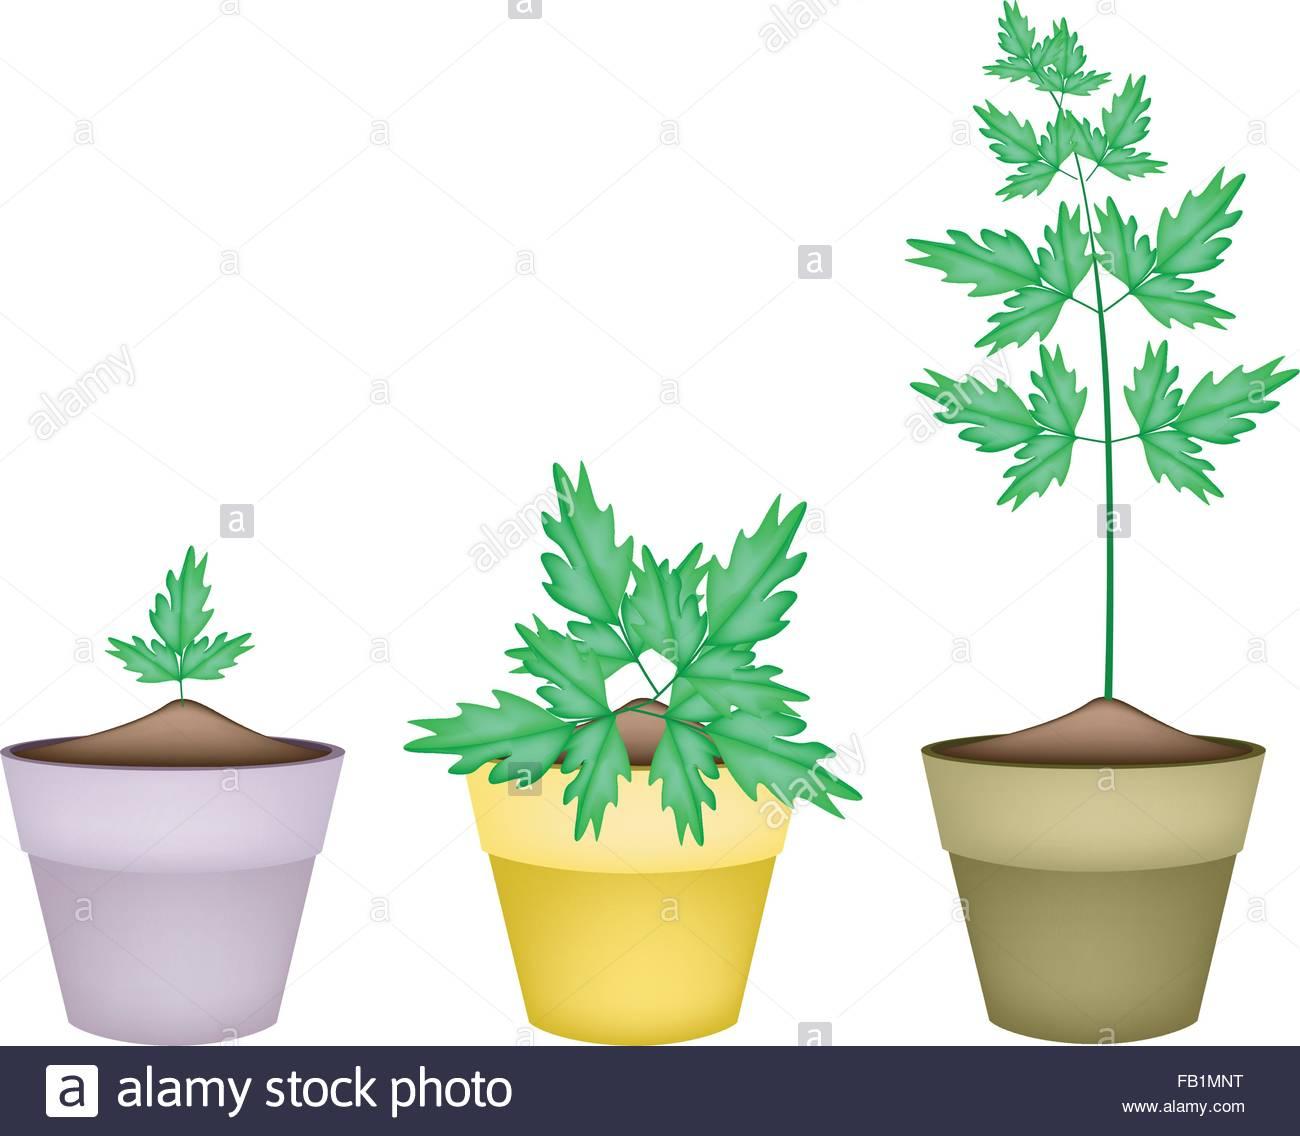 Vegetable And Herb, Illustration Of Three Fresh Water Dropwort Or.